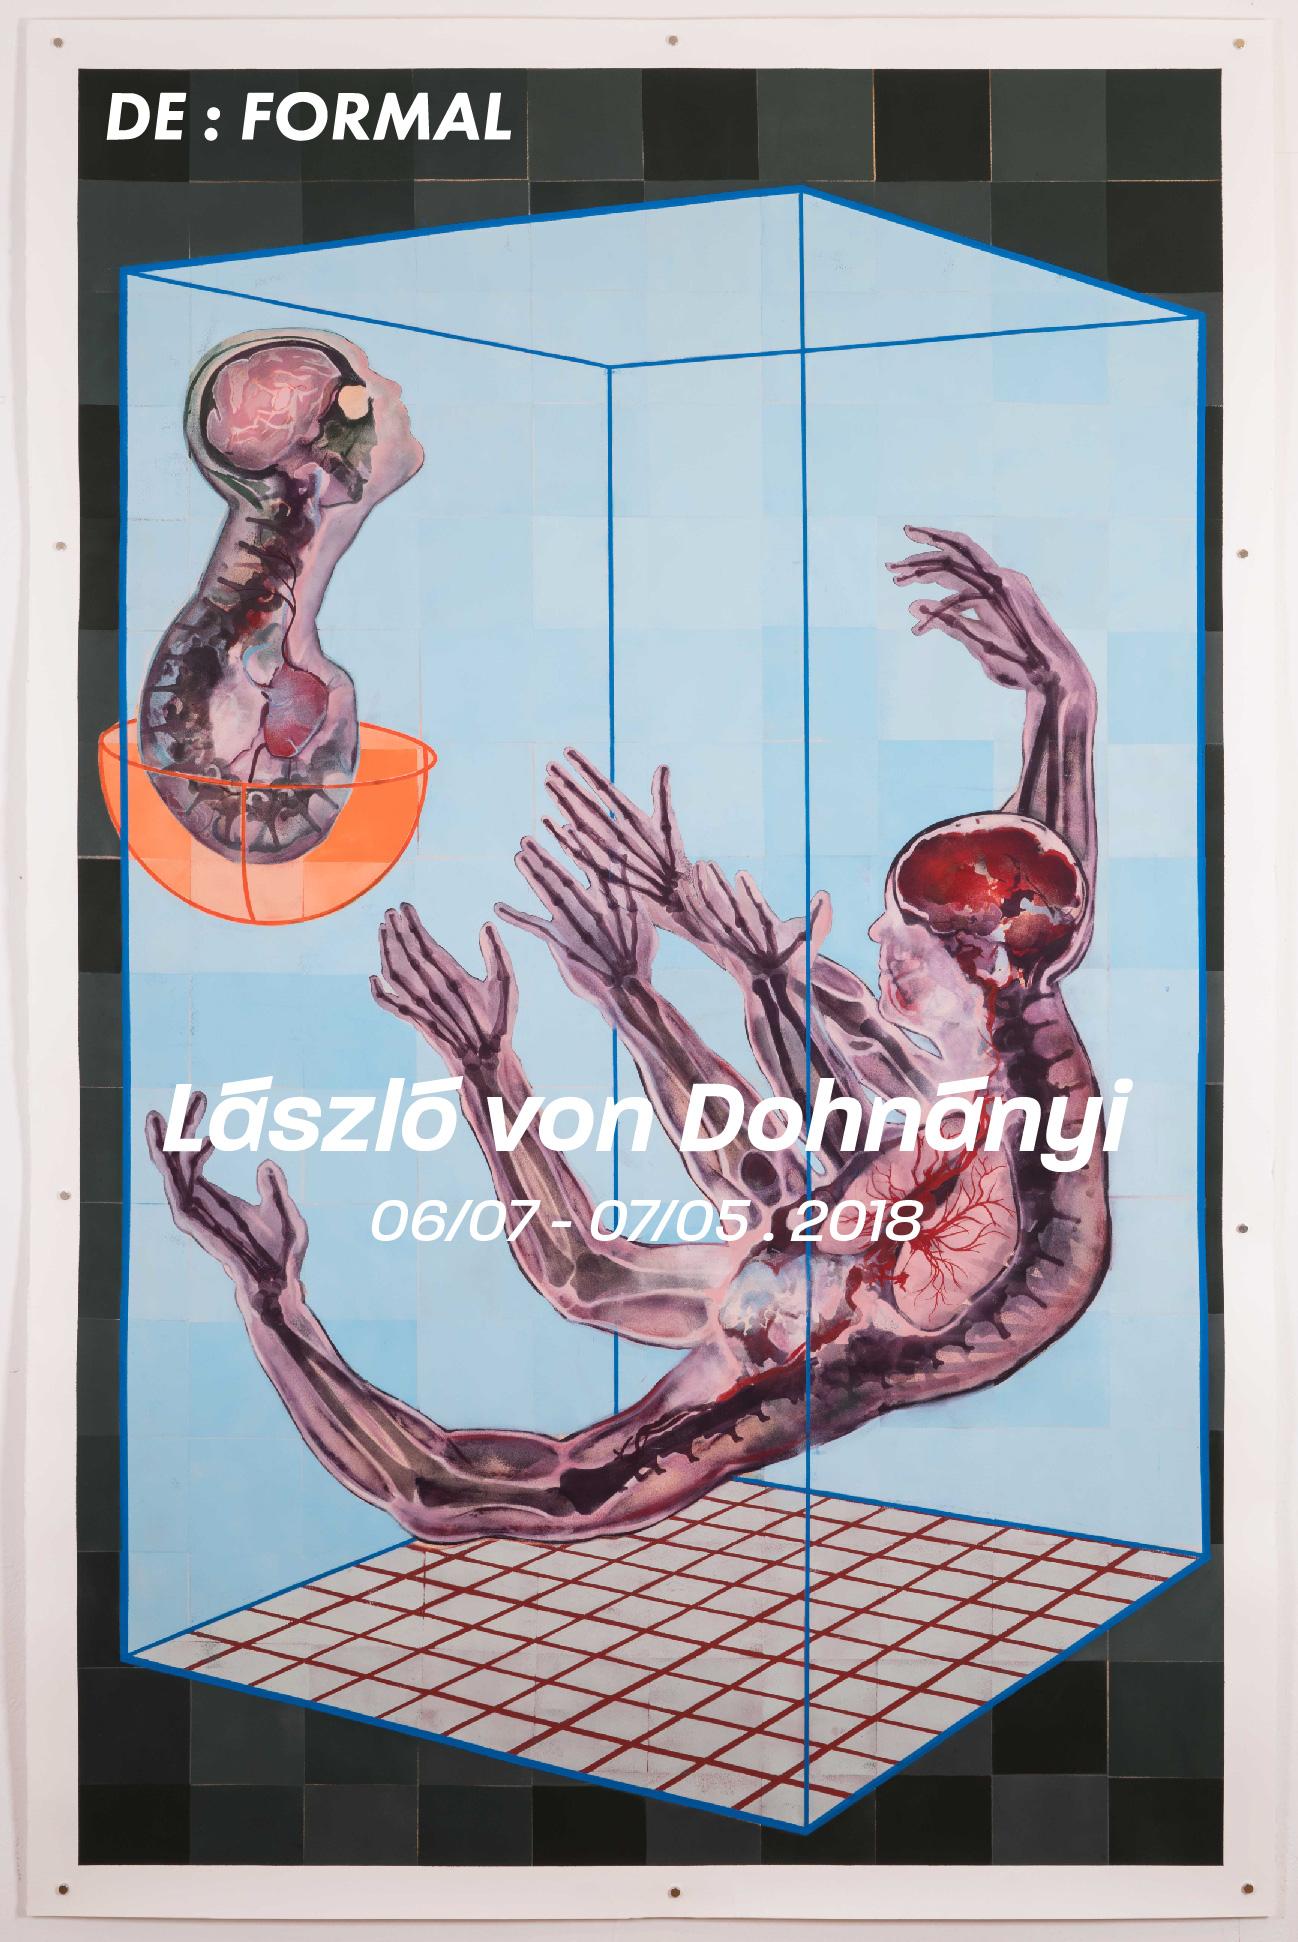 Laszlo poster-01.jpg